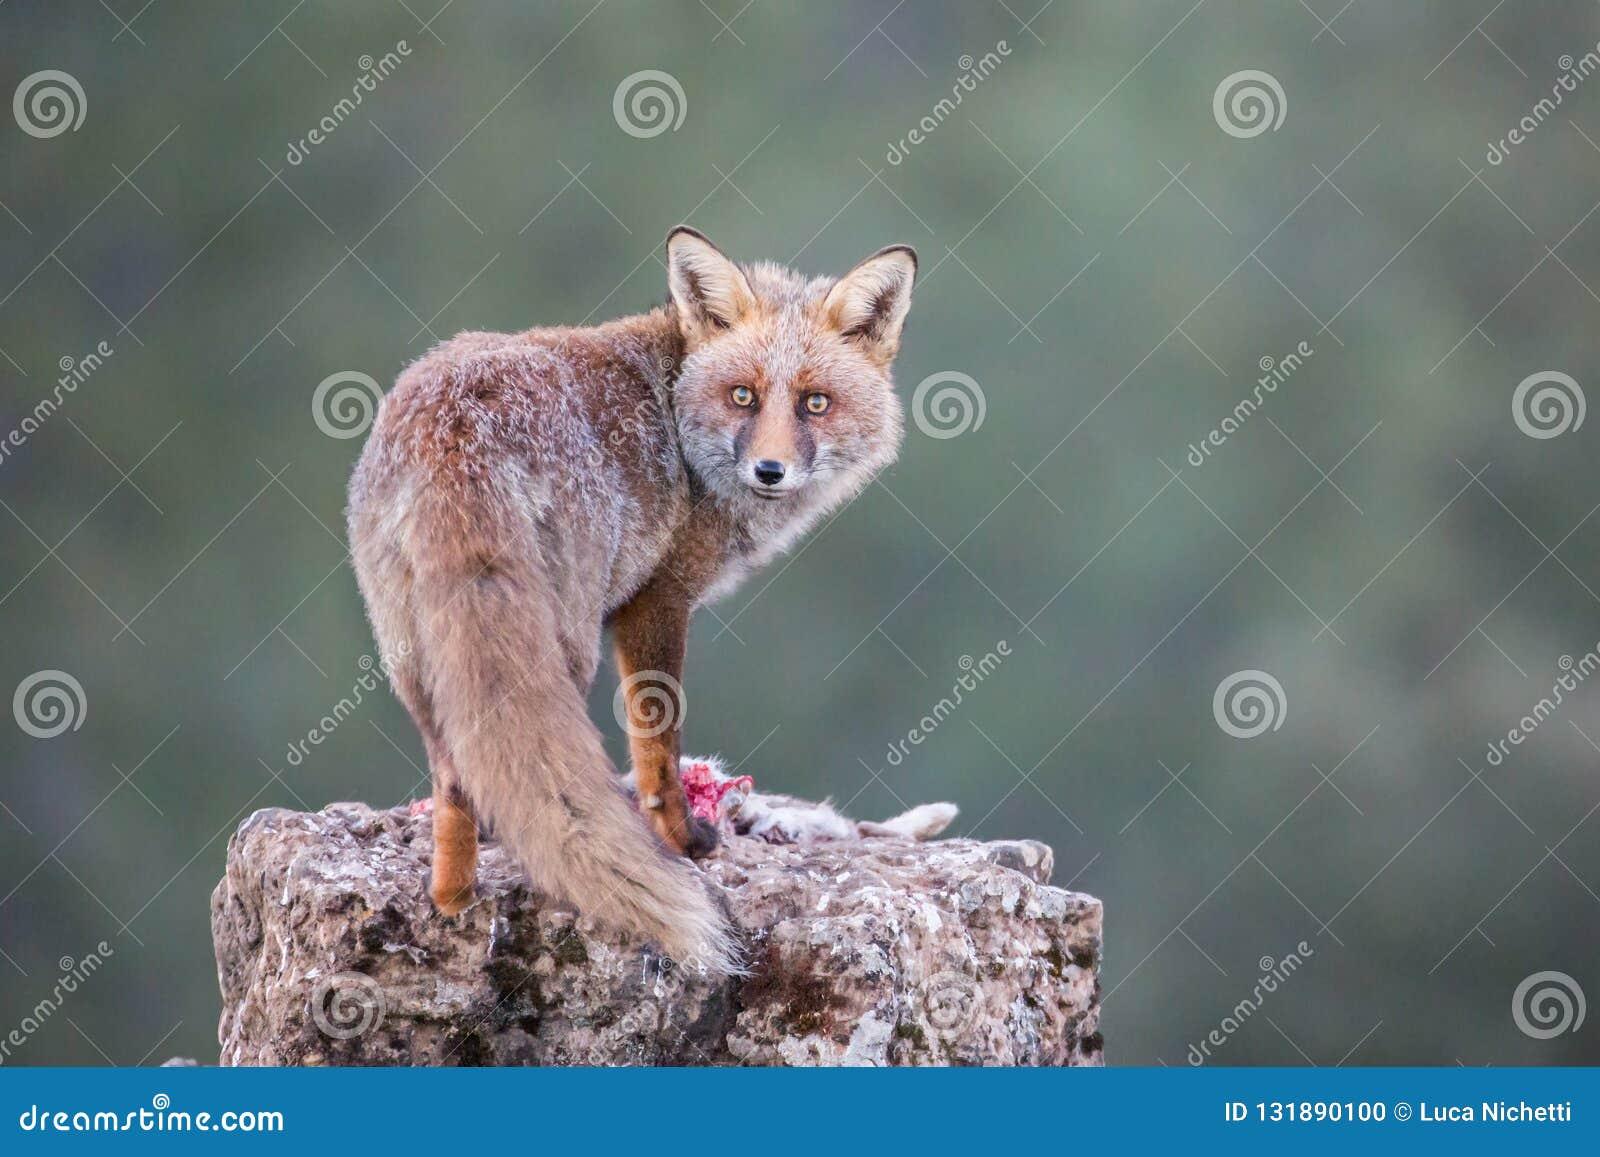 Red Fox (Vulpes vulpes) staring at camera, Andalucia, Spain stock photo